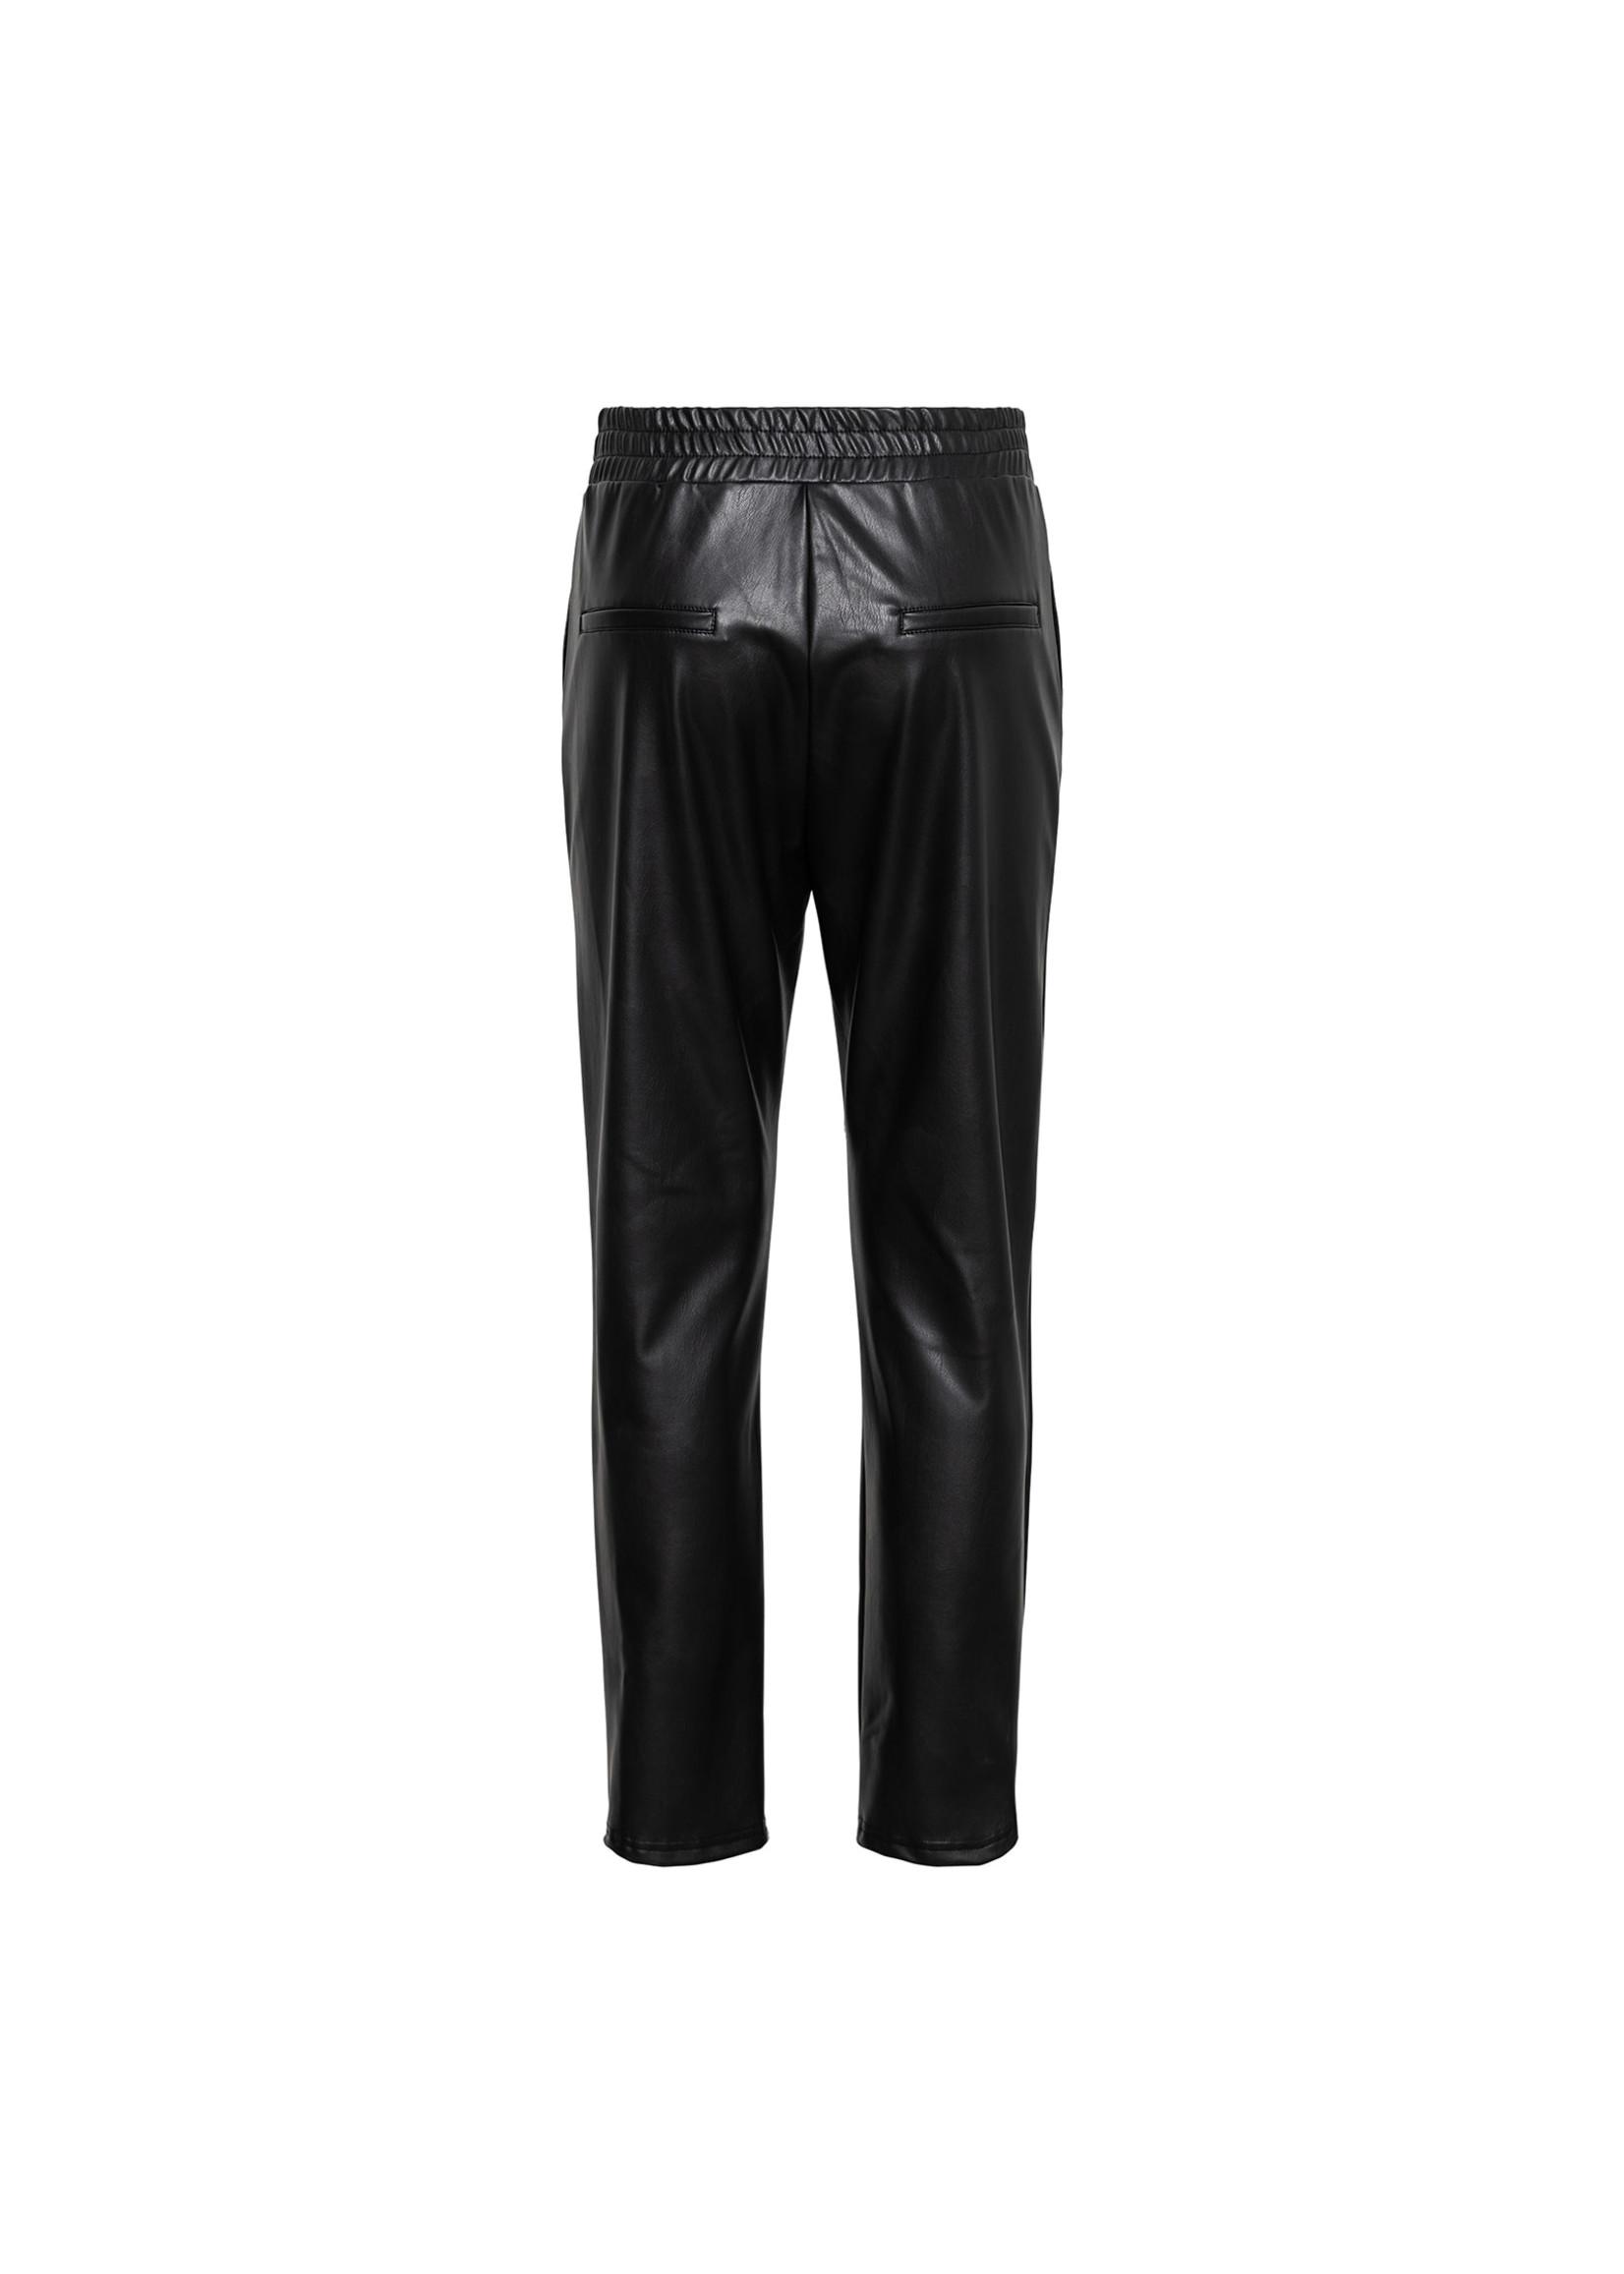 &Co Women Holly pu jogger pants